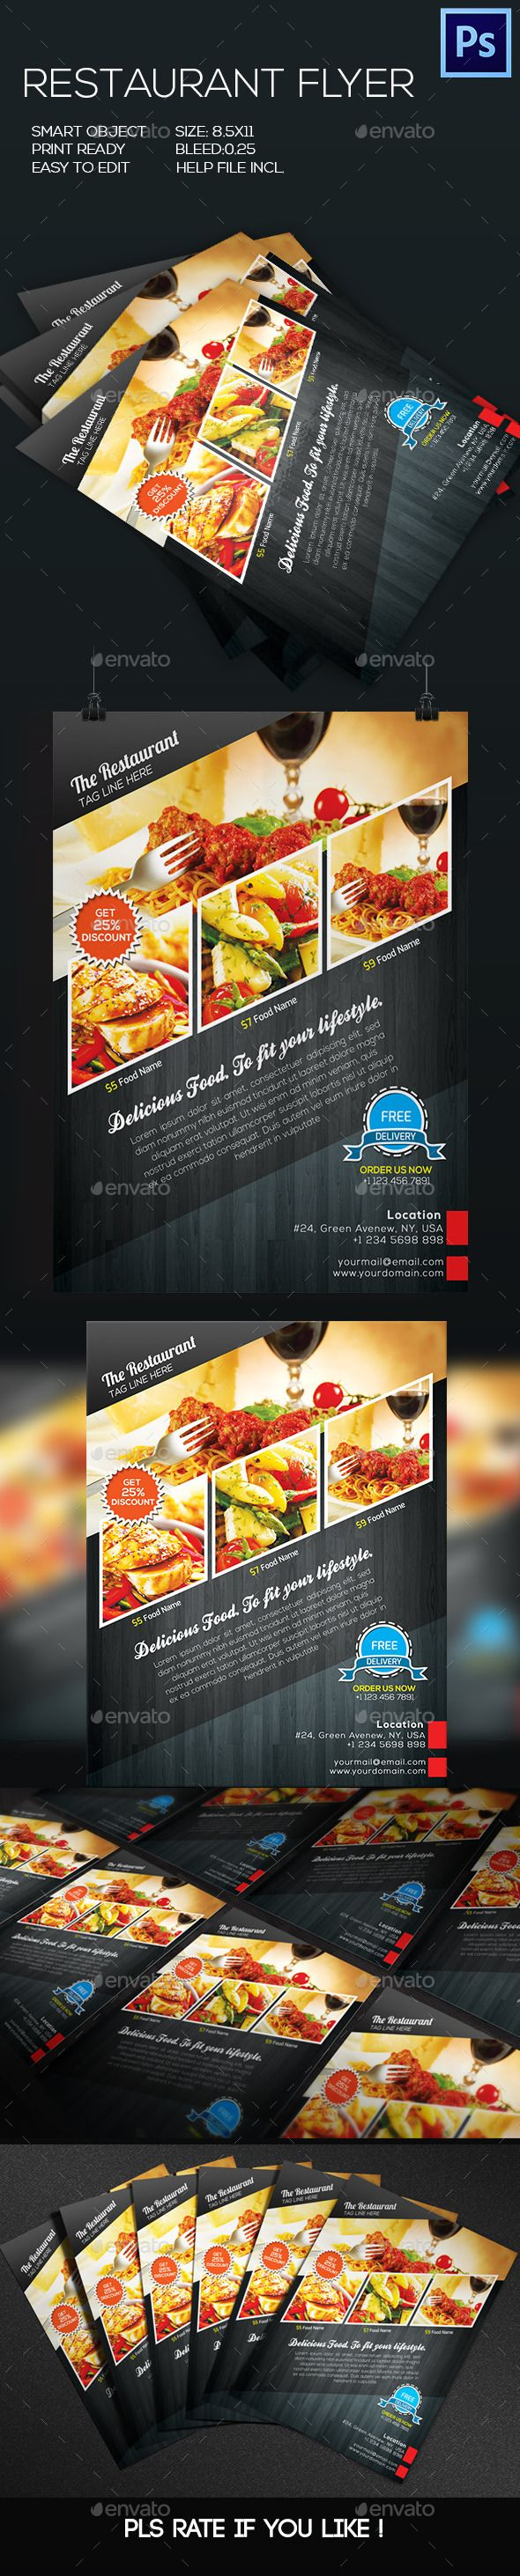 Restaurant Food Flyer Template #design Download: http://graphicriver.net/item/restaurant-food-flyer/8798366?ref=ksioks